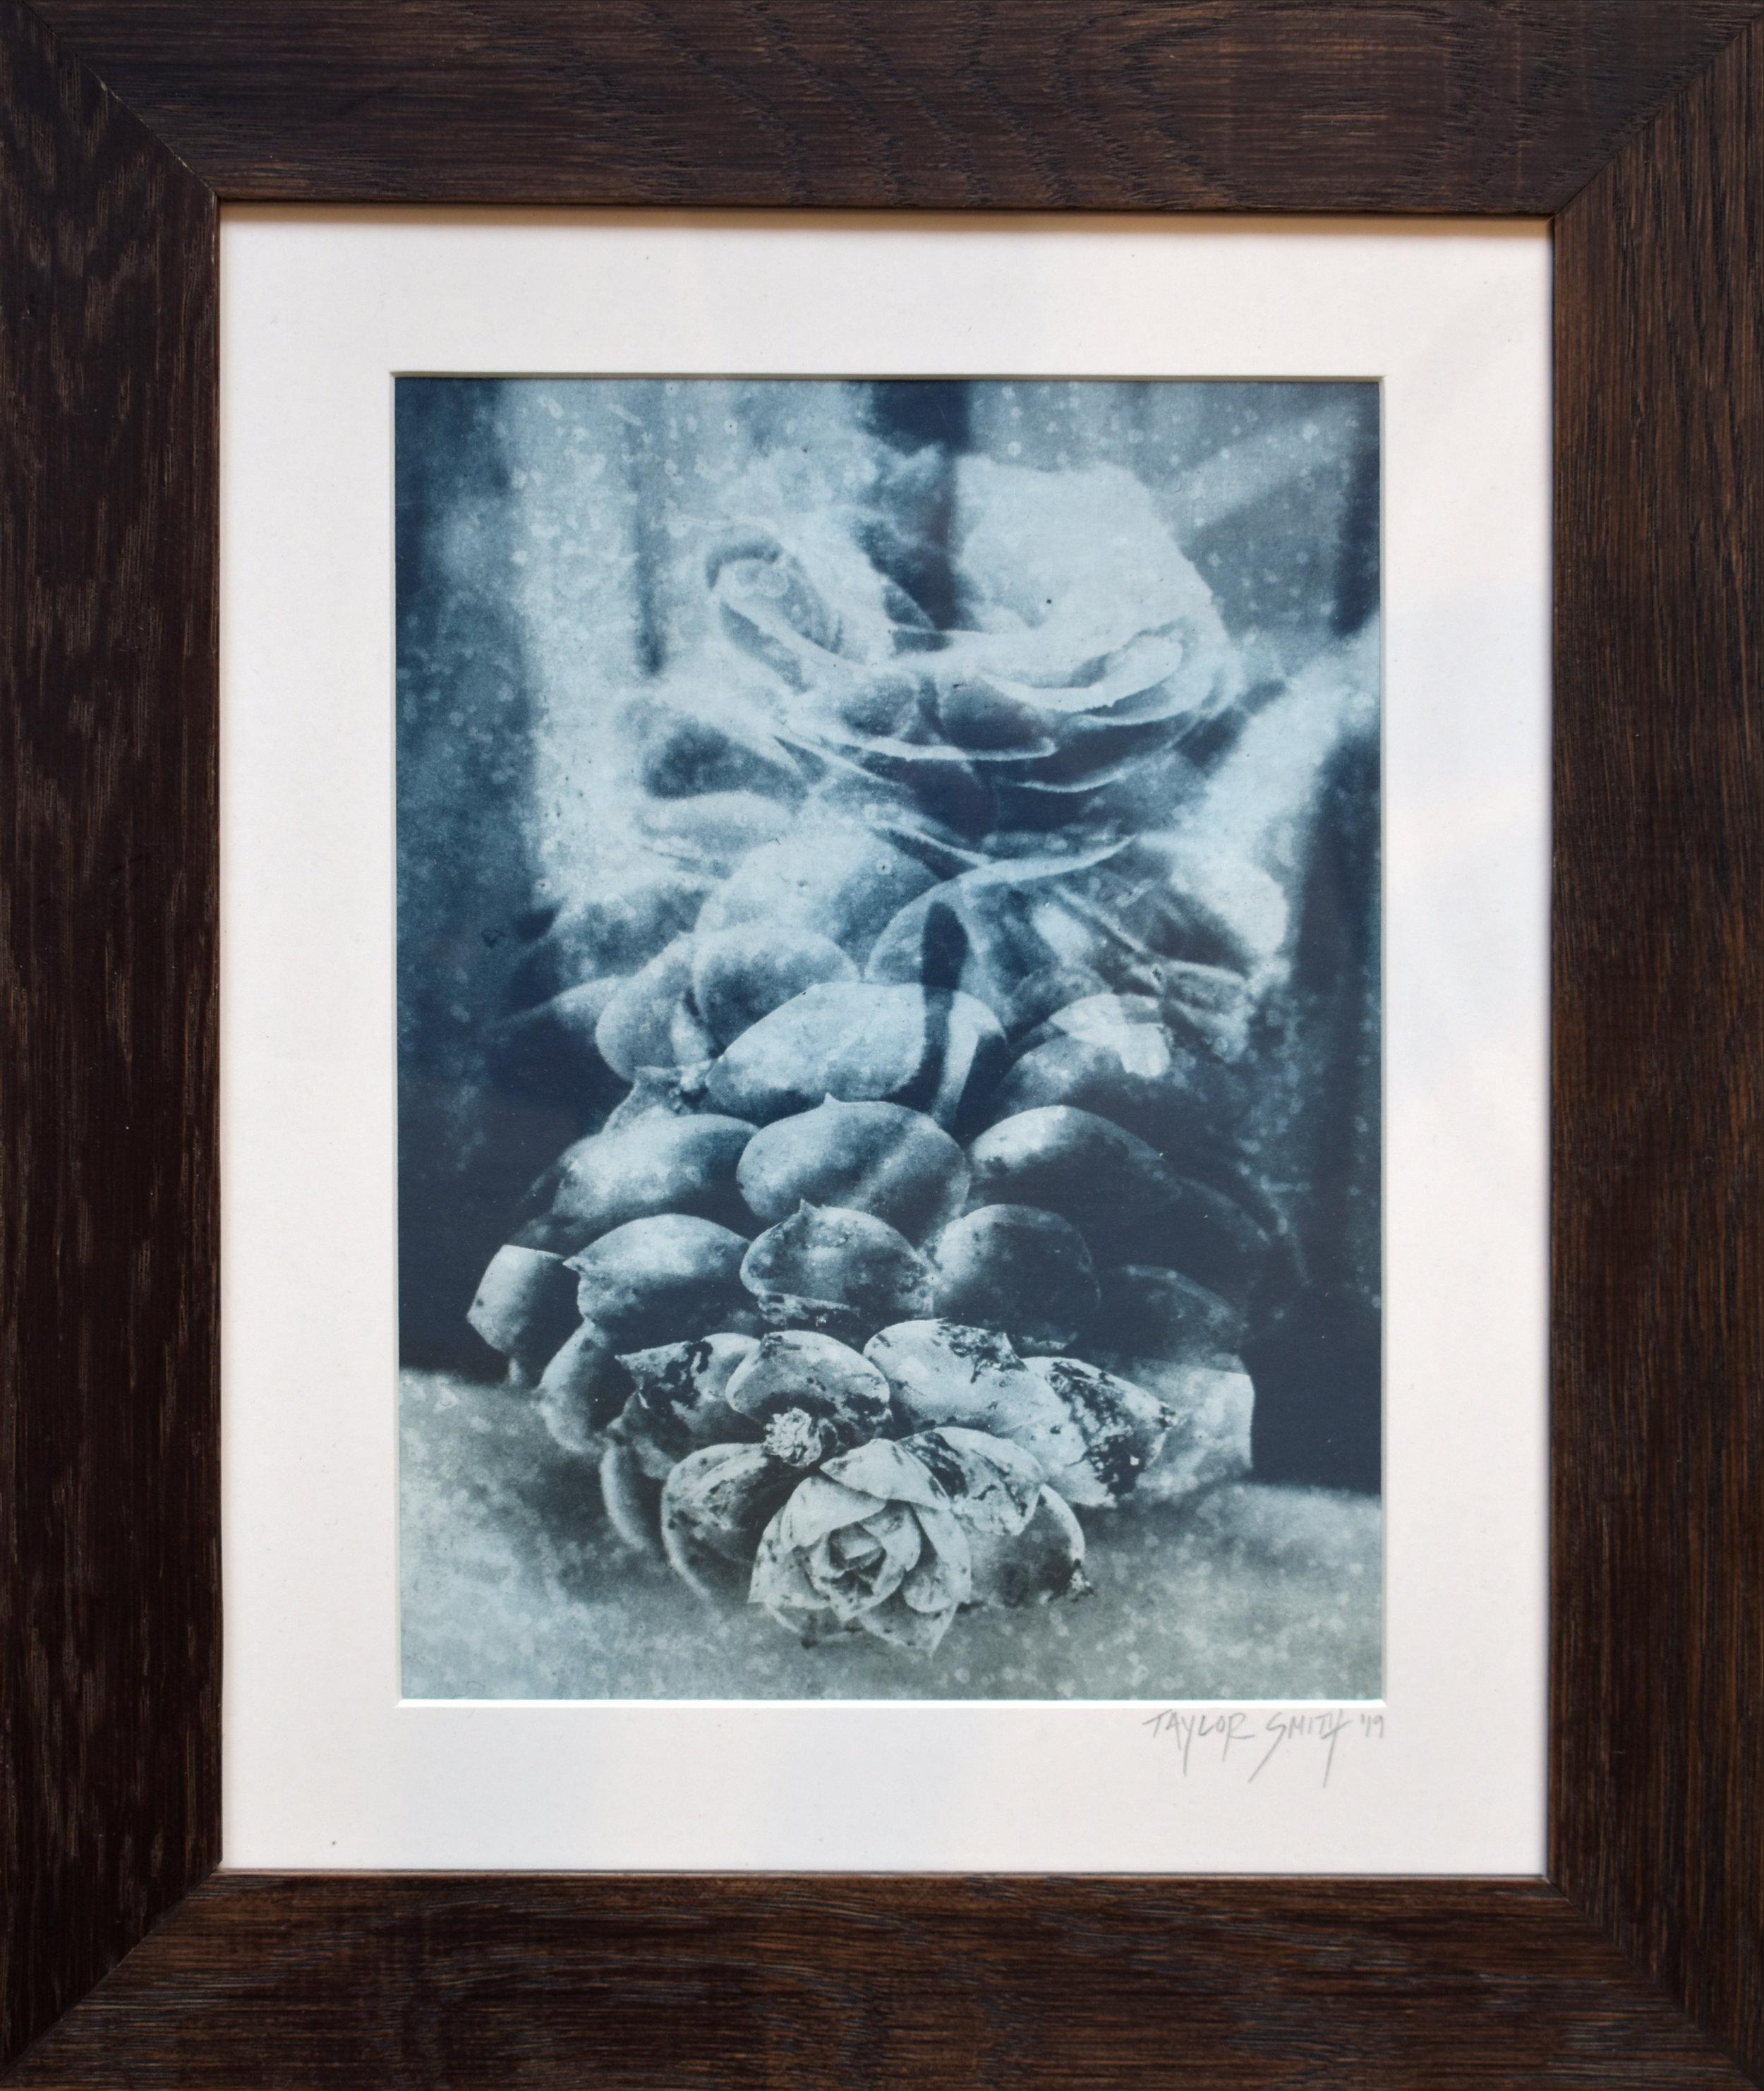 Photogravure, succulent bloom and calcite. 31cm x 37cm (framed). 2019